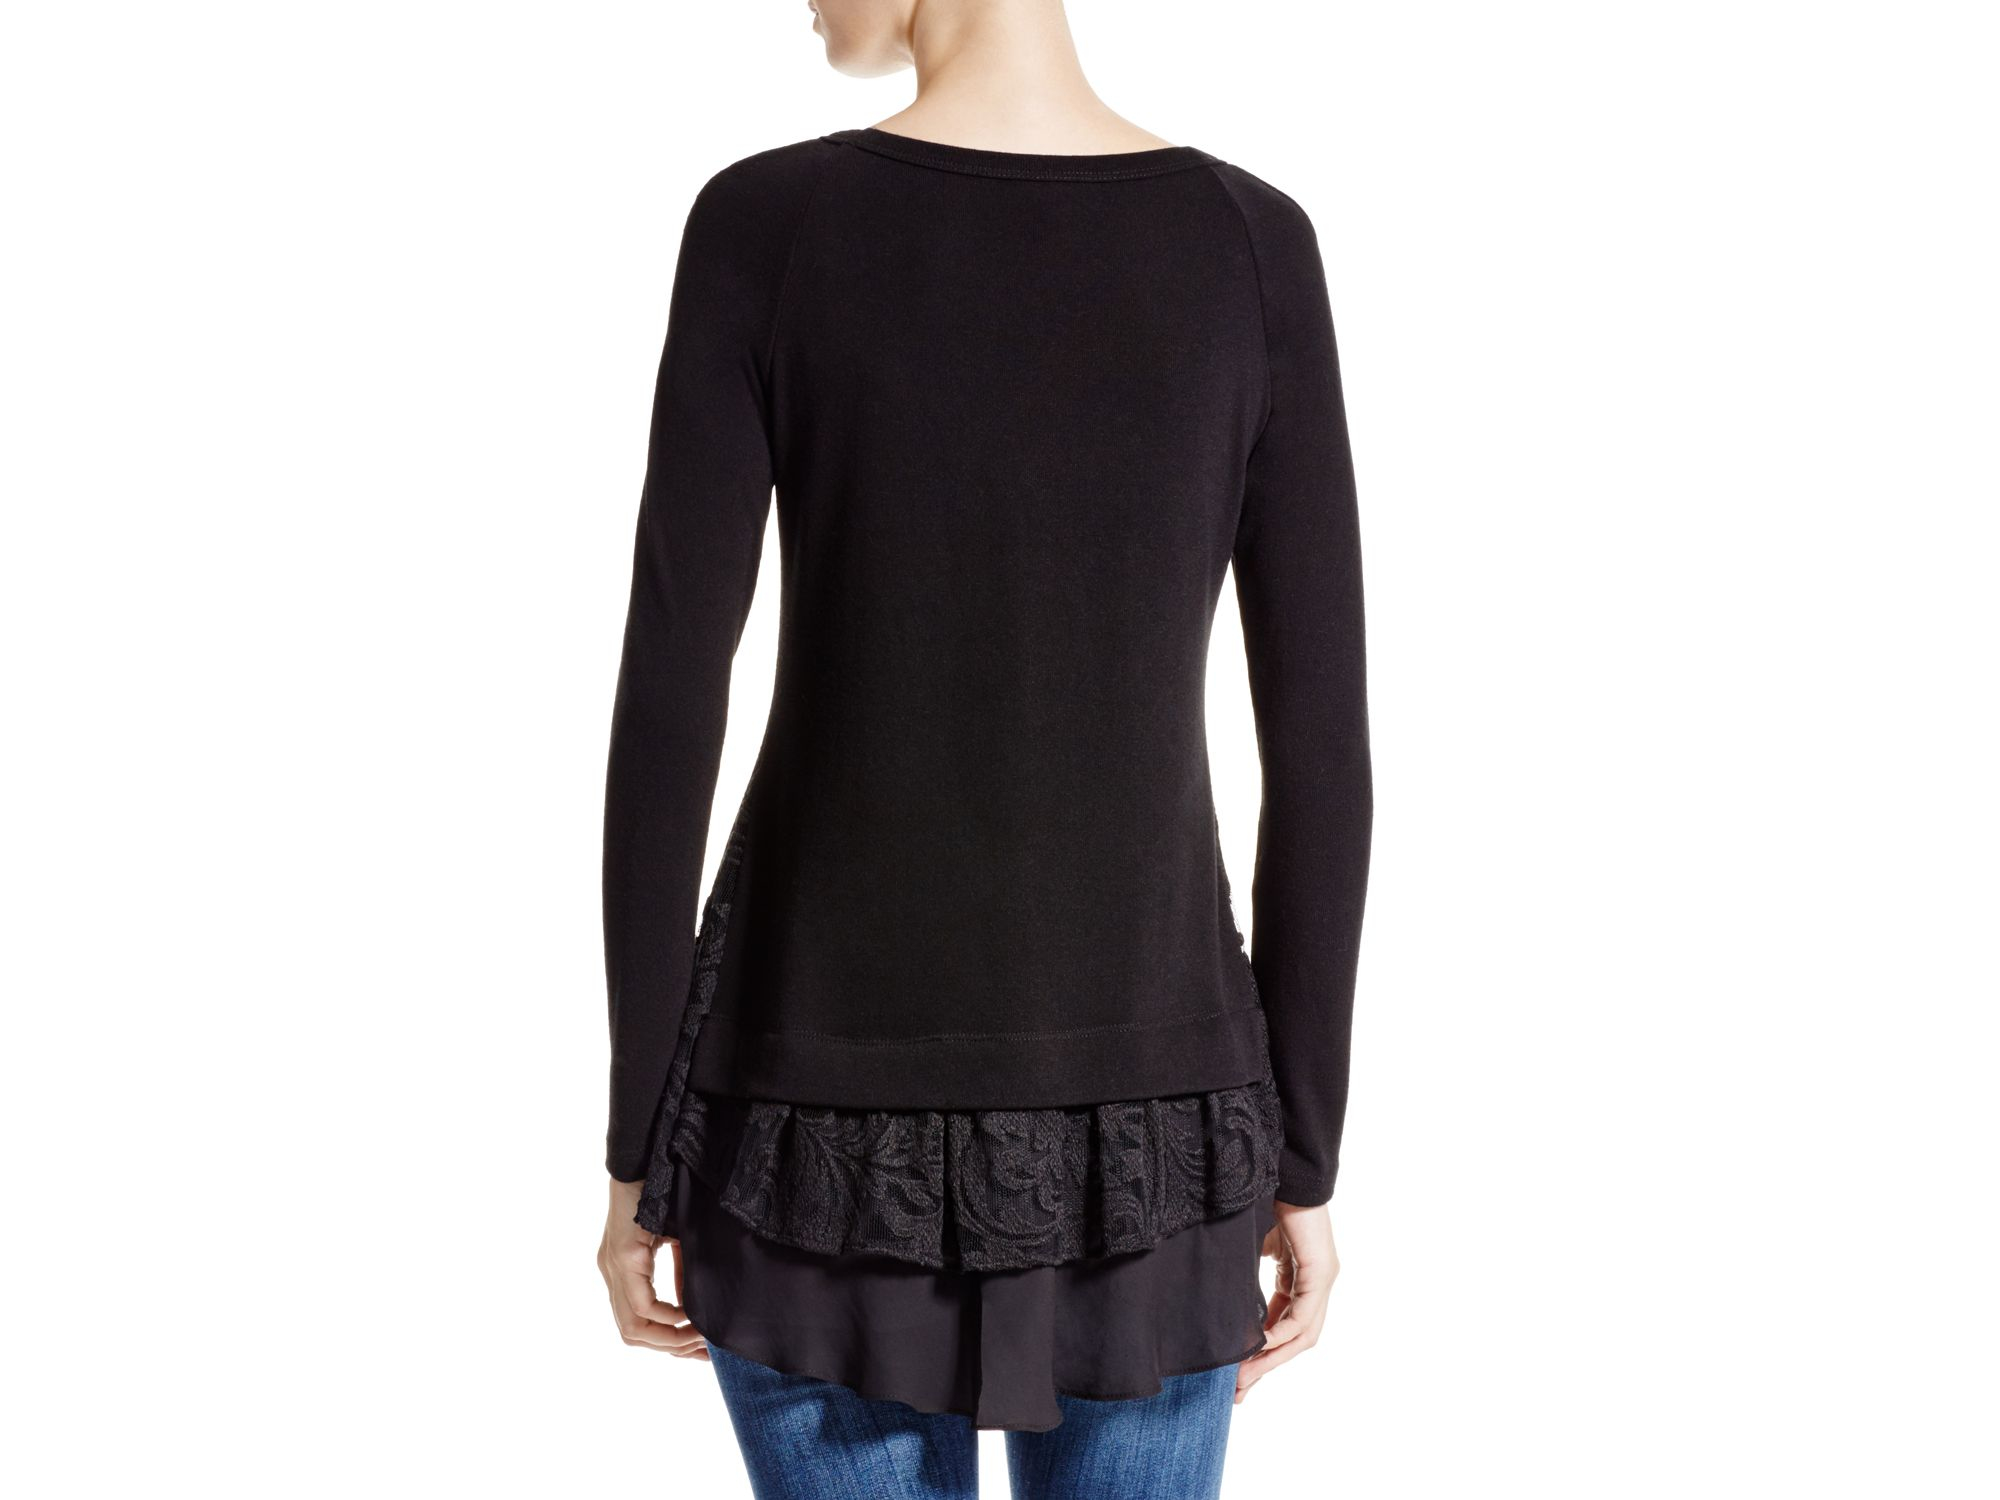 Karen kane Lace And Chiffon Trim Sweater in Black | Lyst